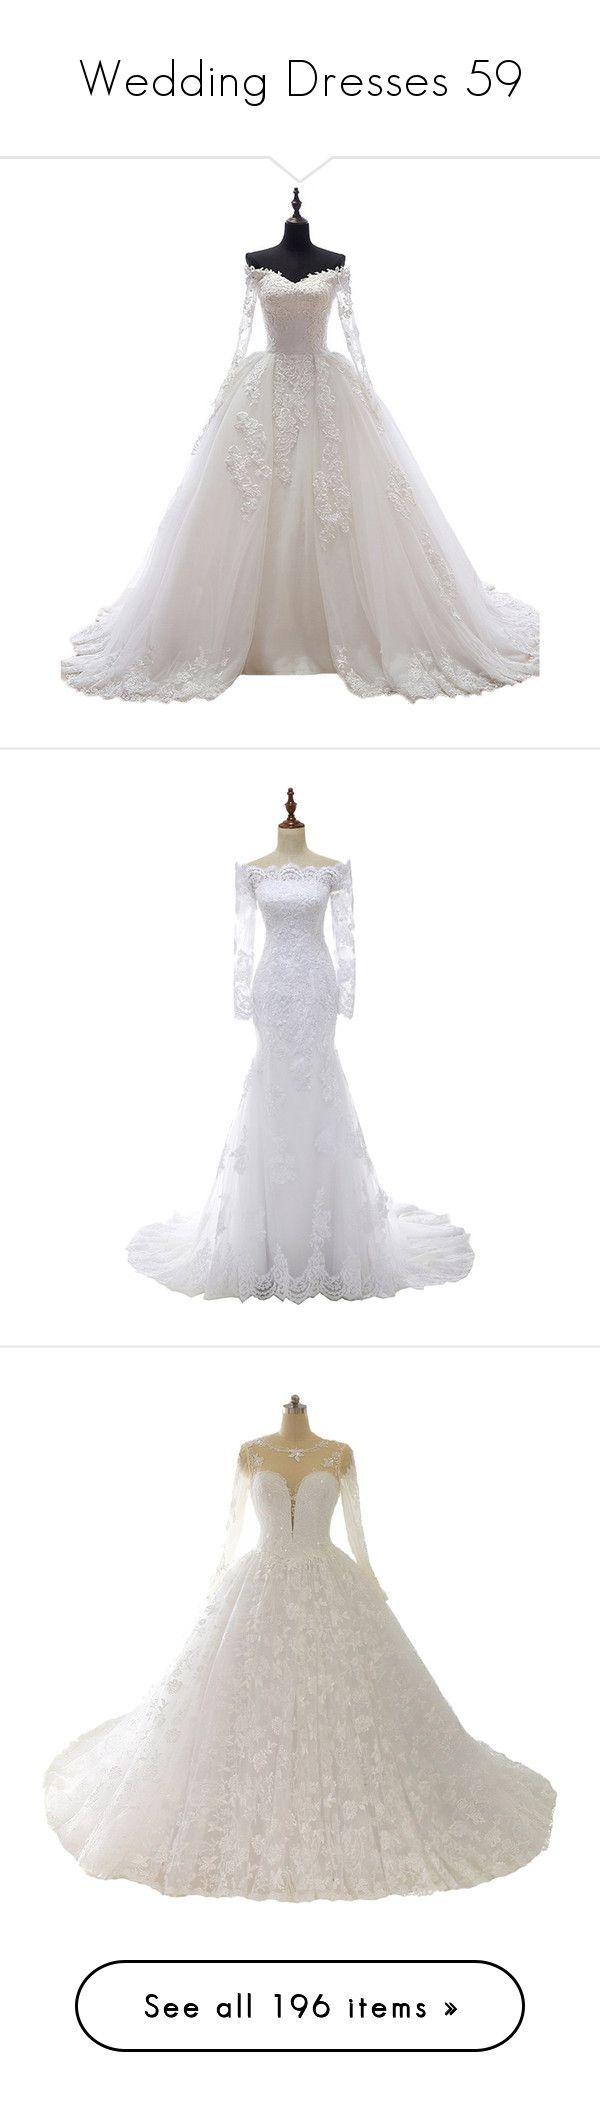 """Wedding Dresses 59"" by singlemom ❤ liked on Polyvore featuring dresses, wedding dresses, wedding, gowns, wedding dress, vintage white dress, vintage white lace dress, sheer dress, white lace dress and off white dresses"